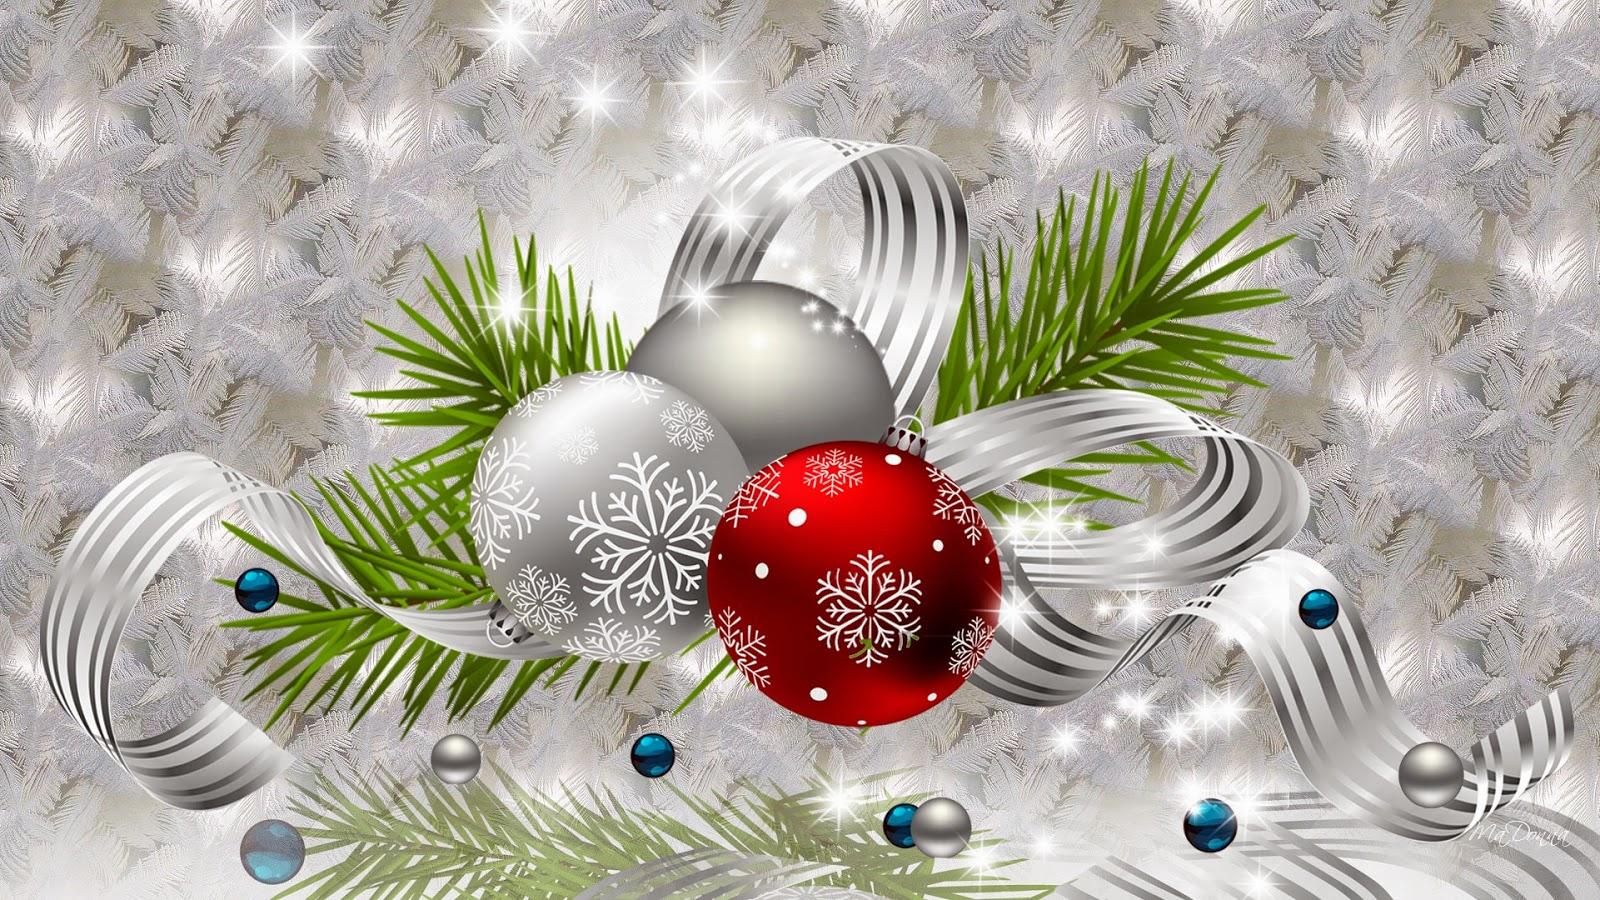 Christmas tree baubles decorations beautiful balls designs